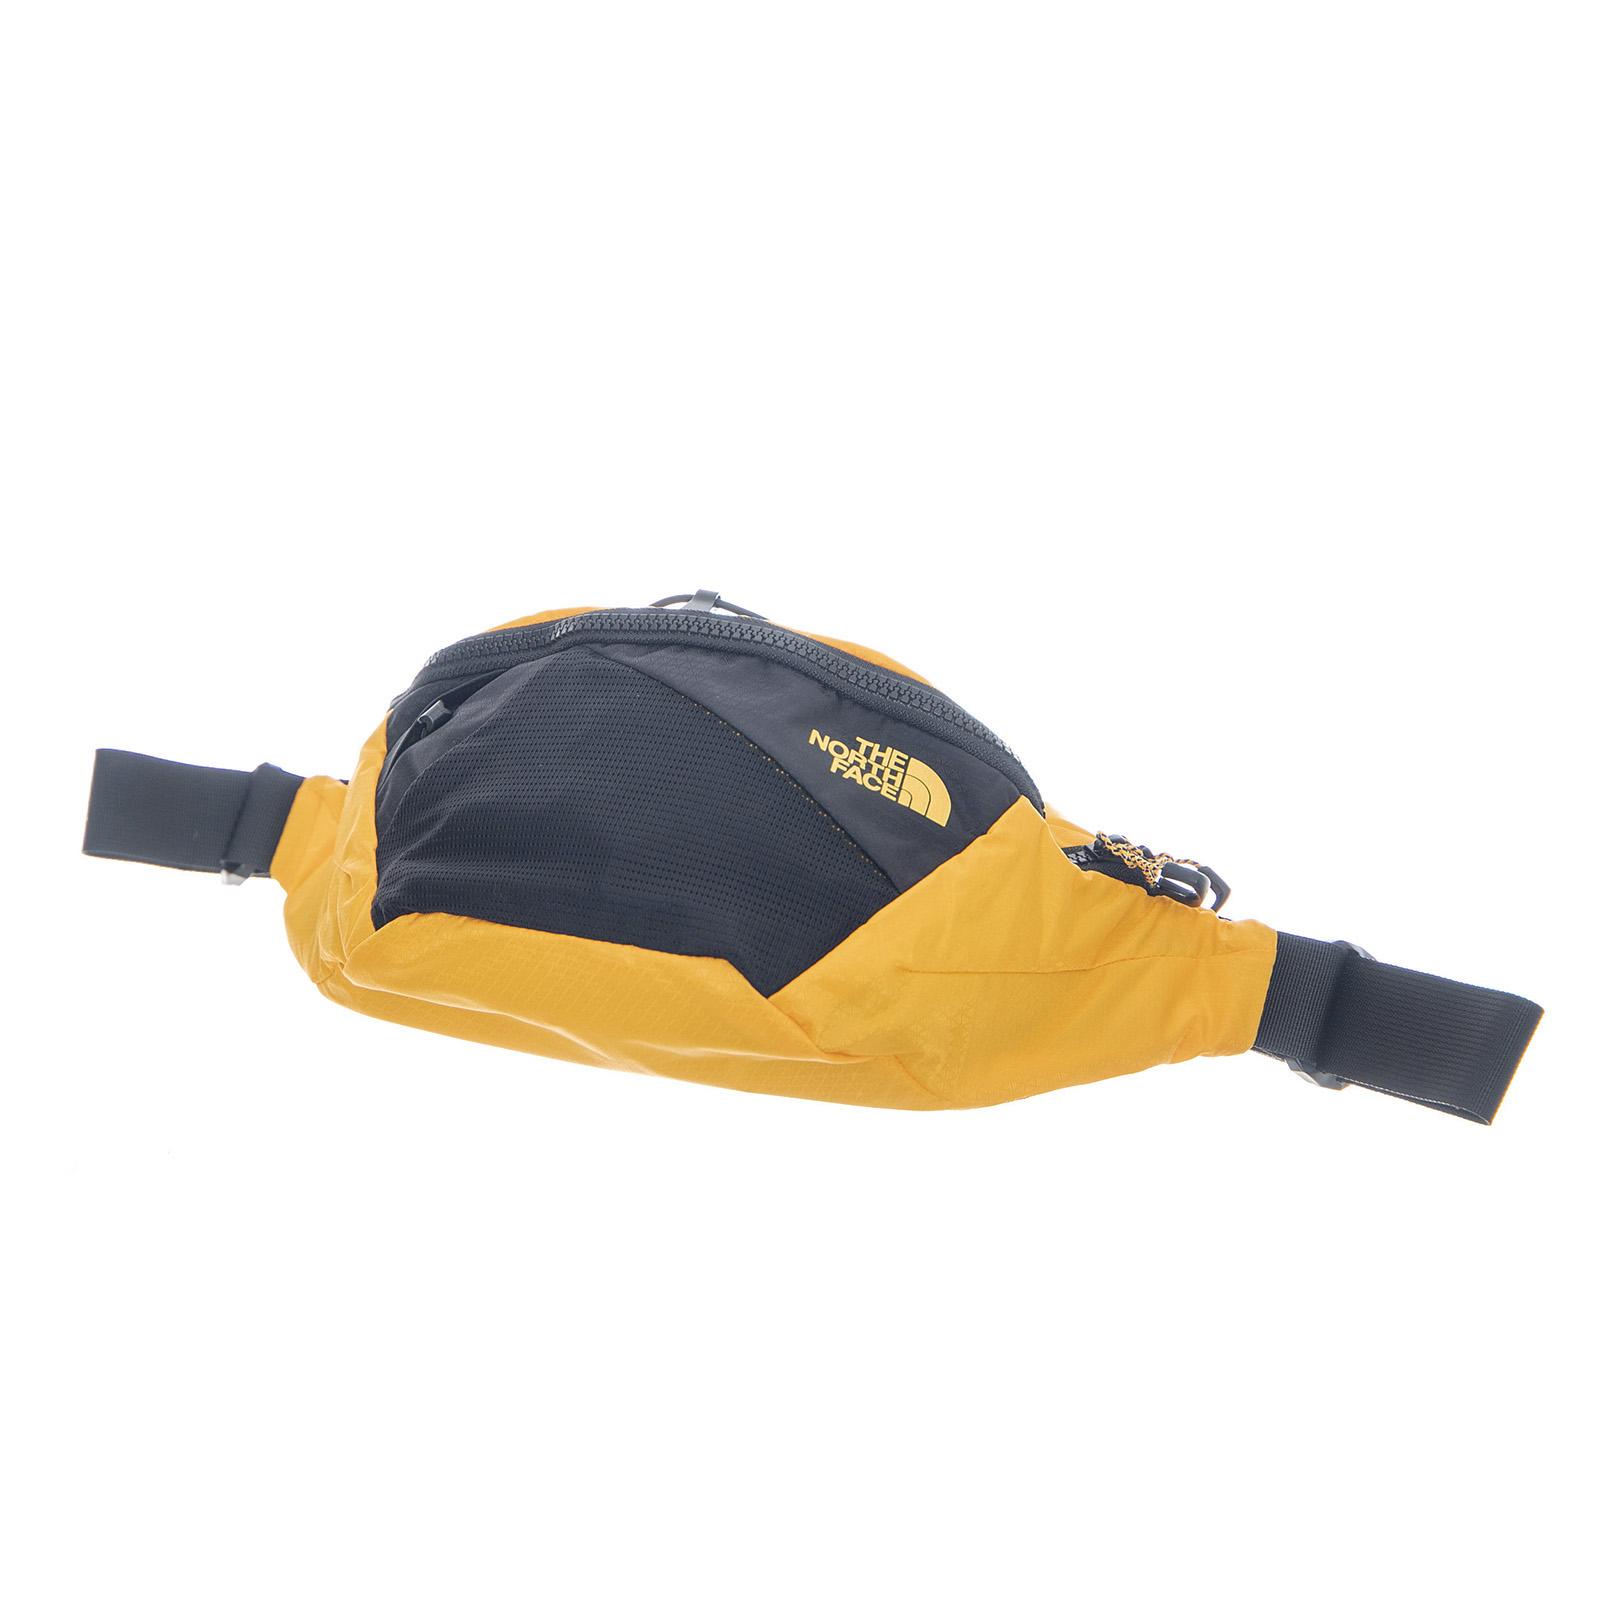 0fa3e55ef Details about The North Face Lumbnical Lumbar Bum bag Small - Zinnia  Orange/Tnf Black Bum bag